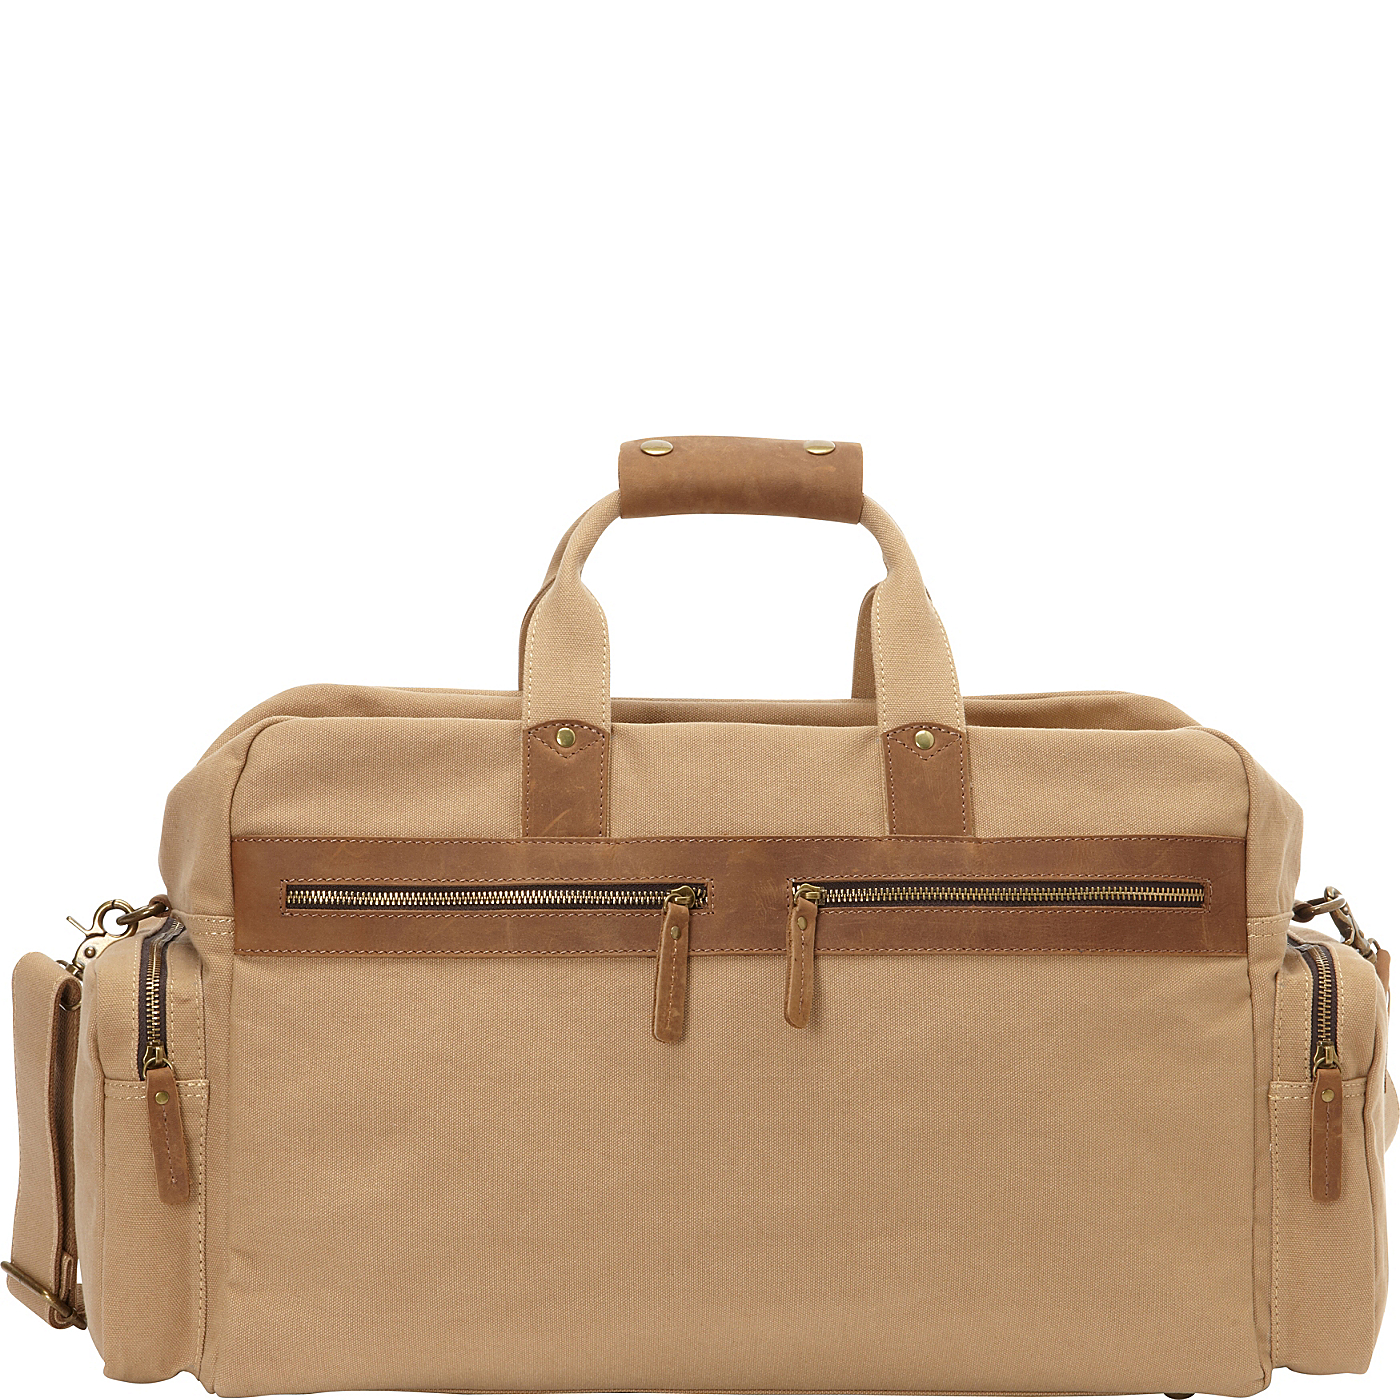 3ebe3179e7fa Vagabond Traveler Classic Large Canvas Duffle Travel Bag on PopScreen